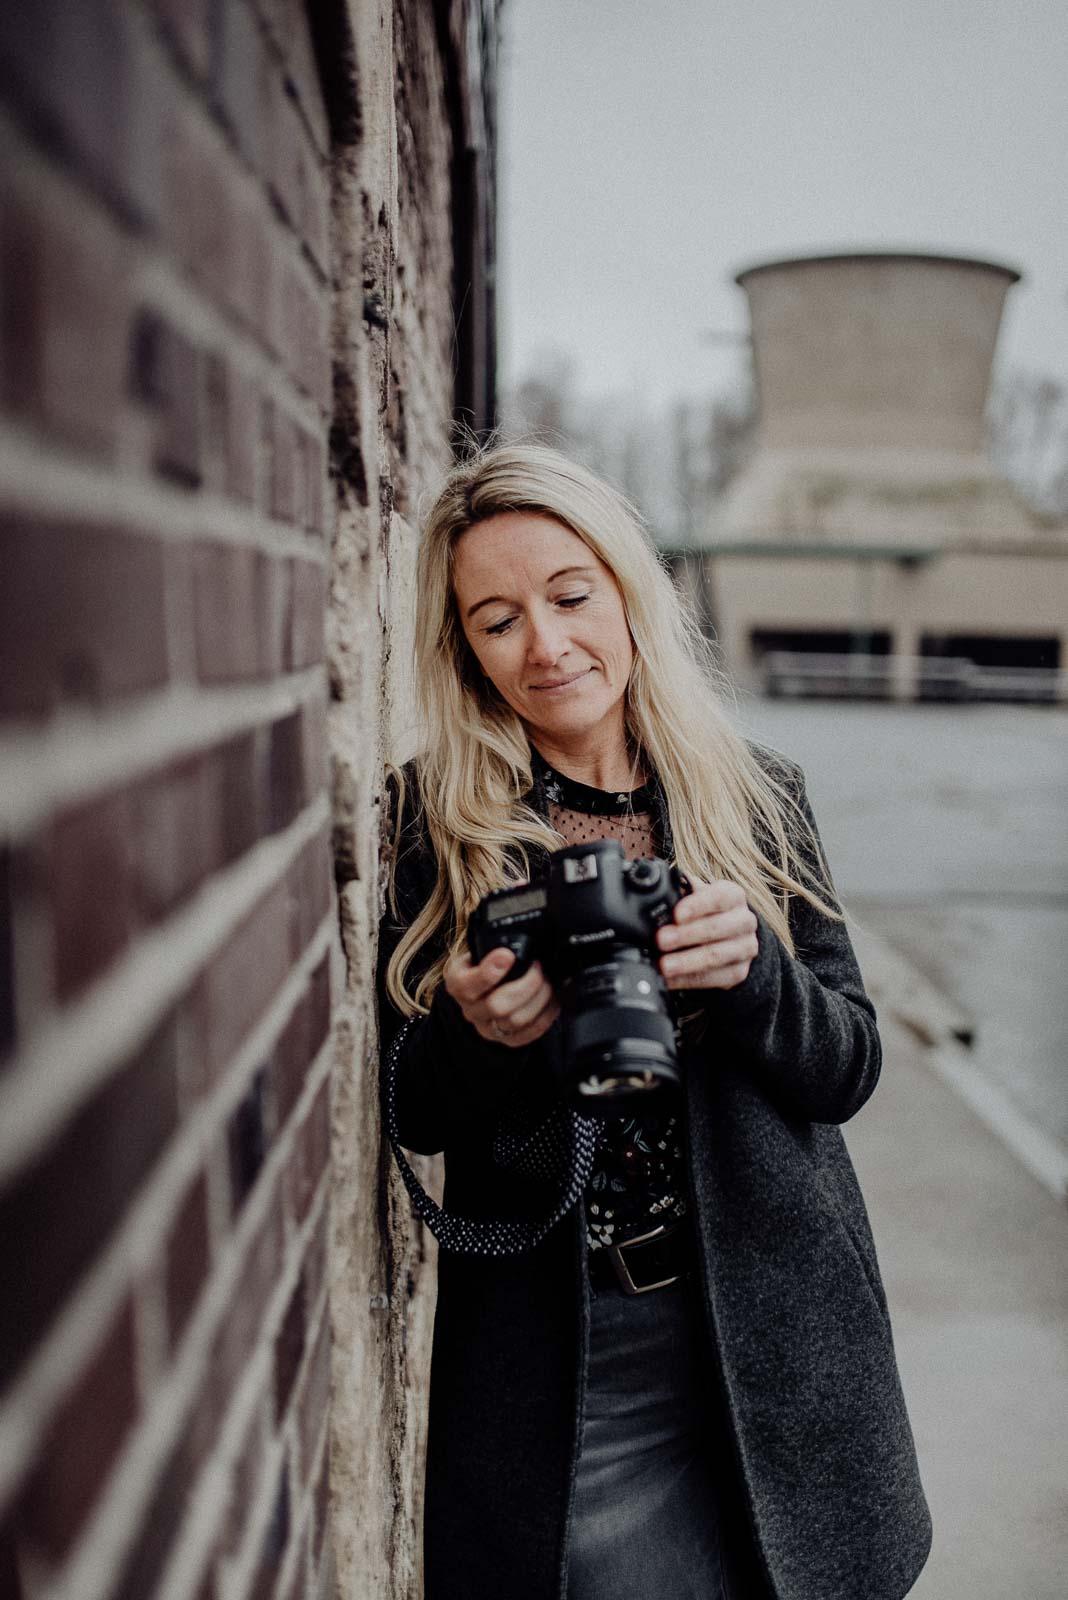 041-fotograf-witten-bochum-businessshooting-urban